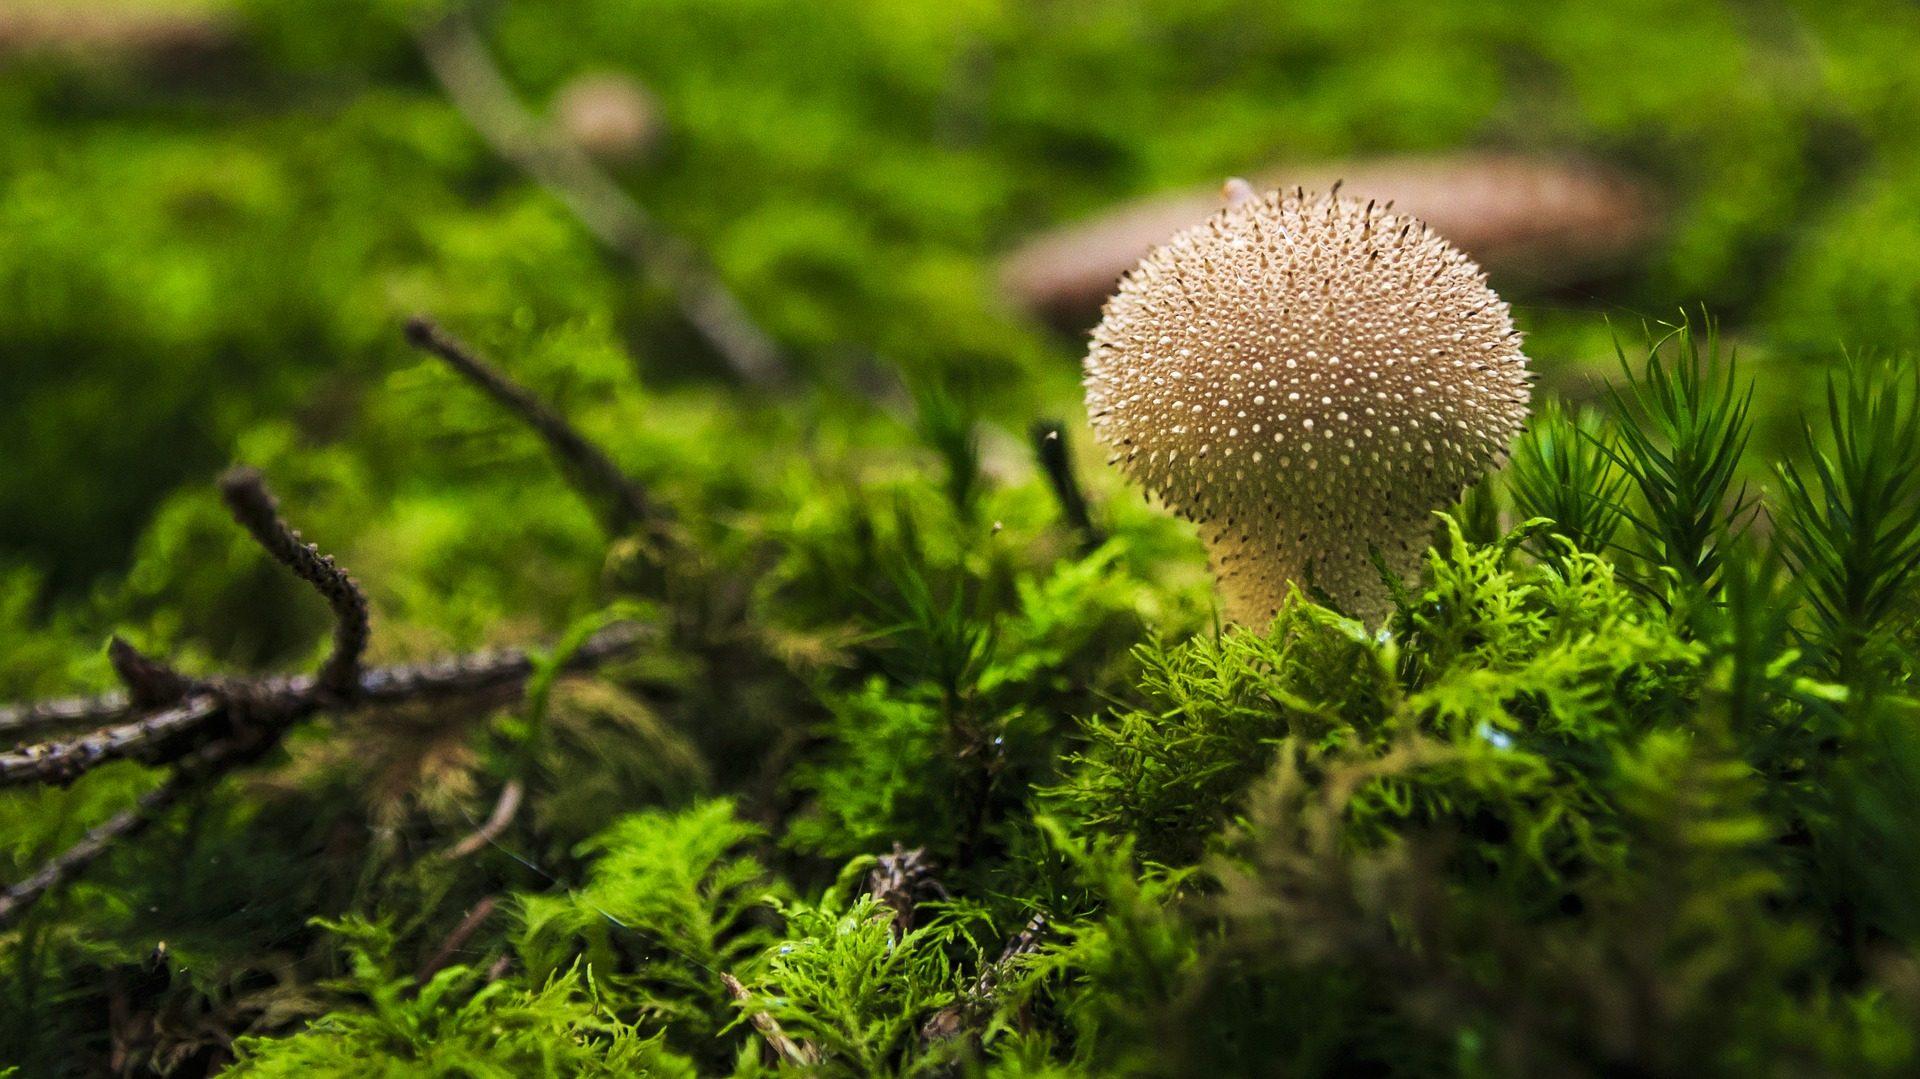 Hongo, Seth, foresta, umidità, piante - Sfondi HD - Professor-falken.com